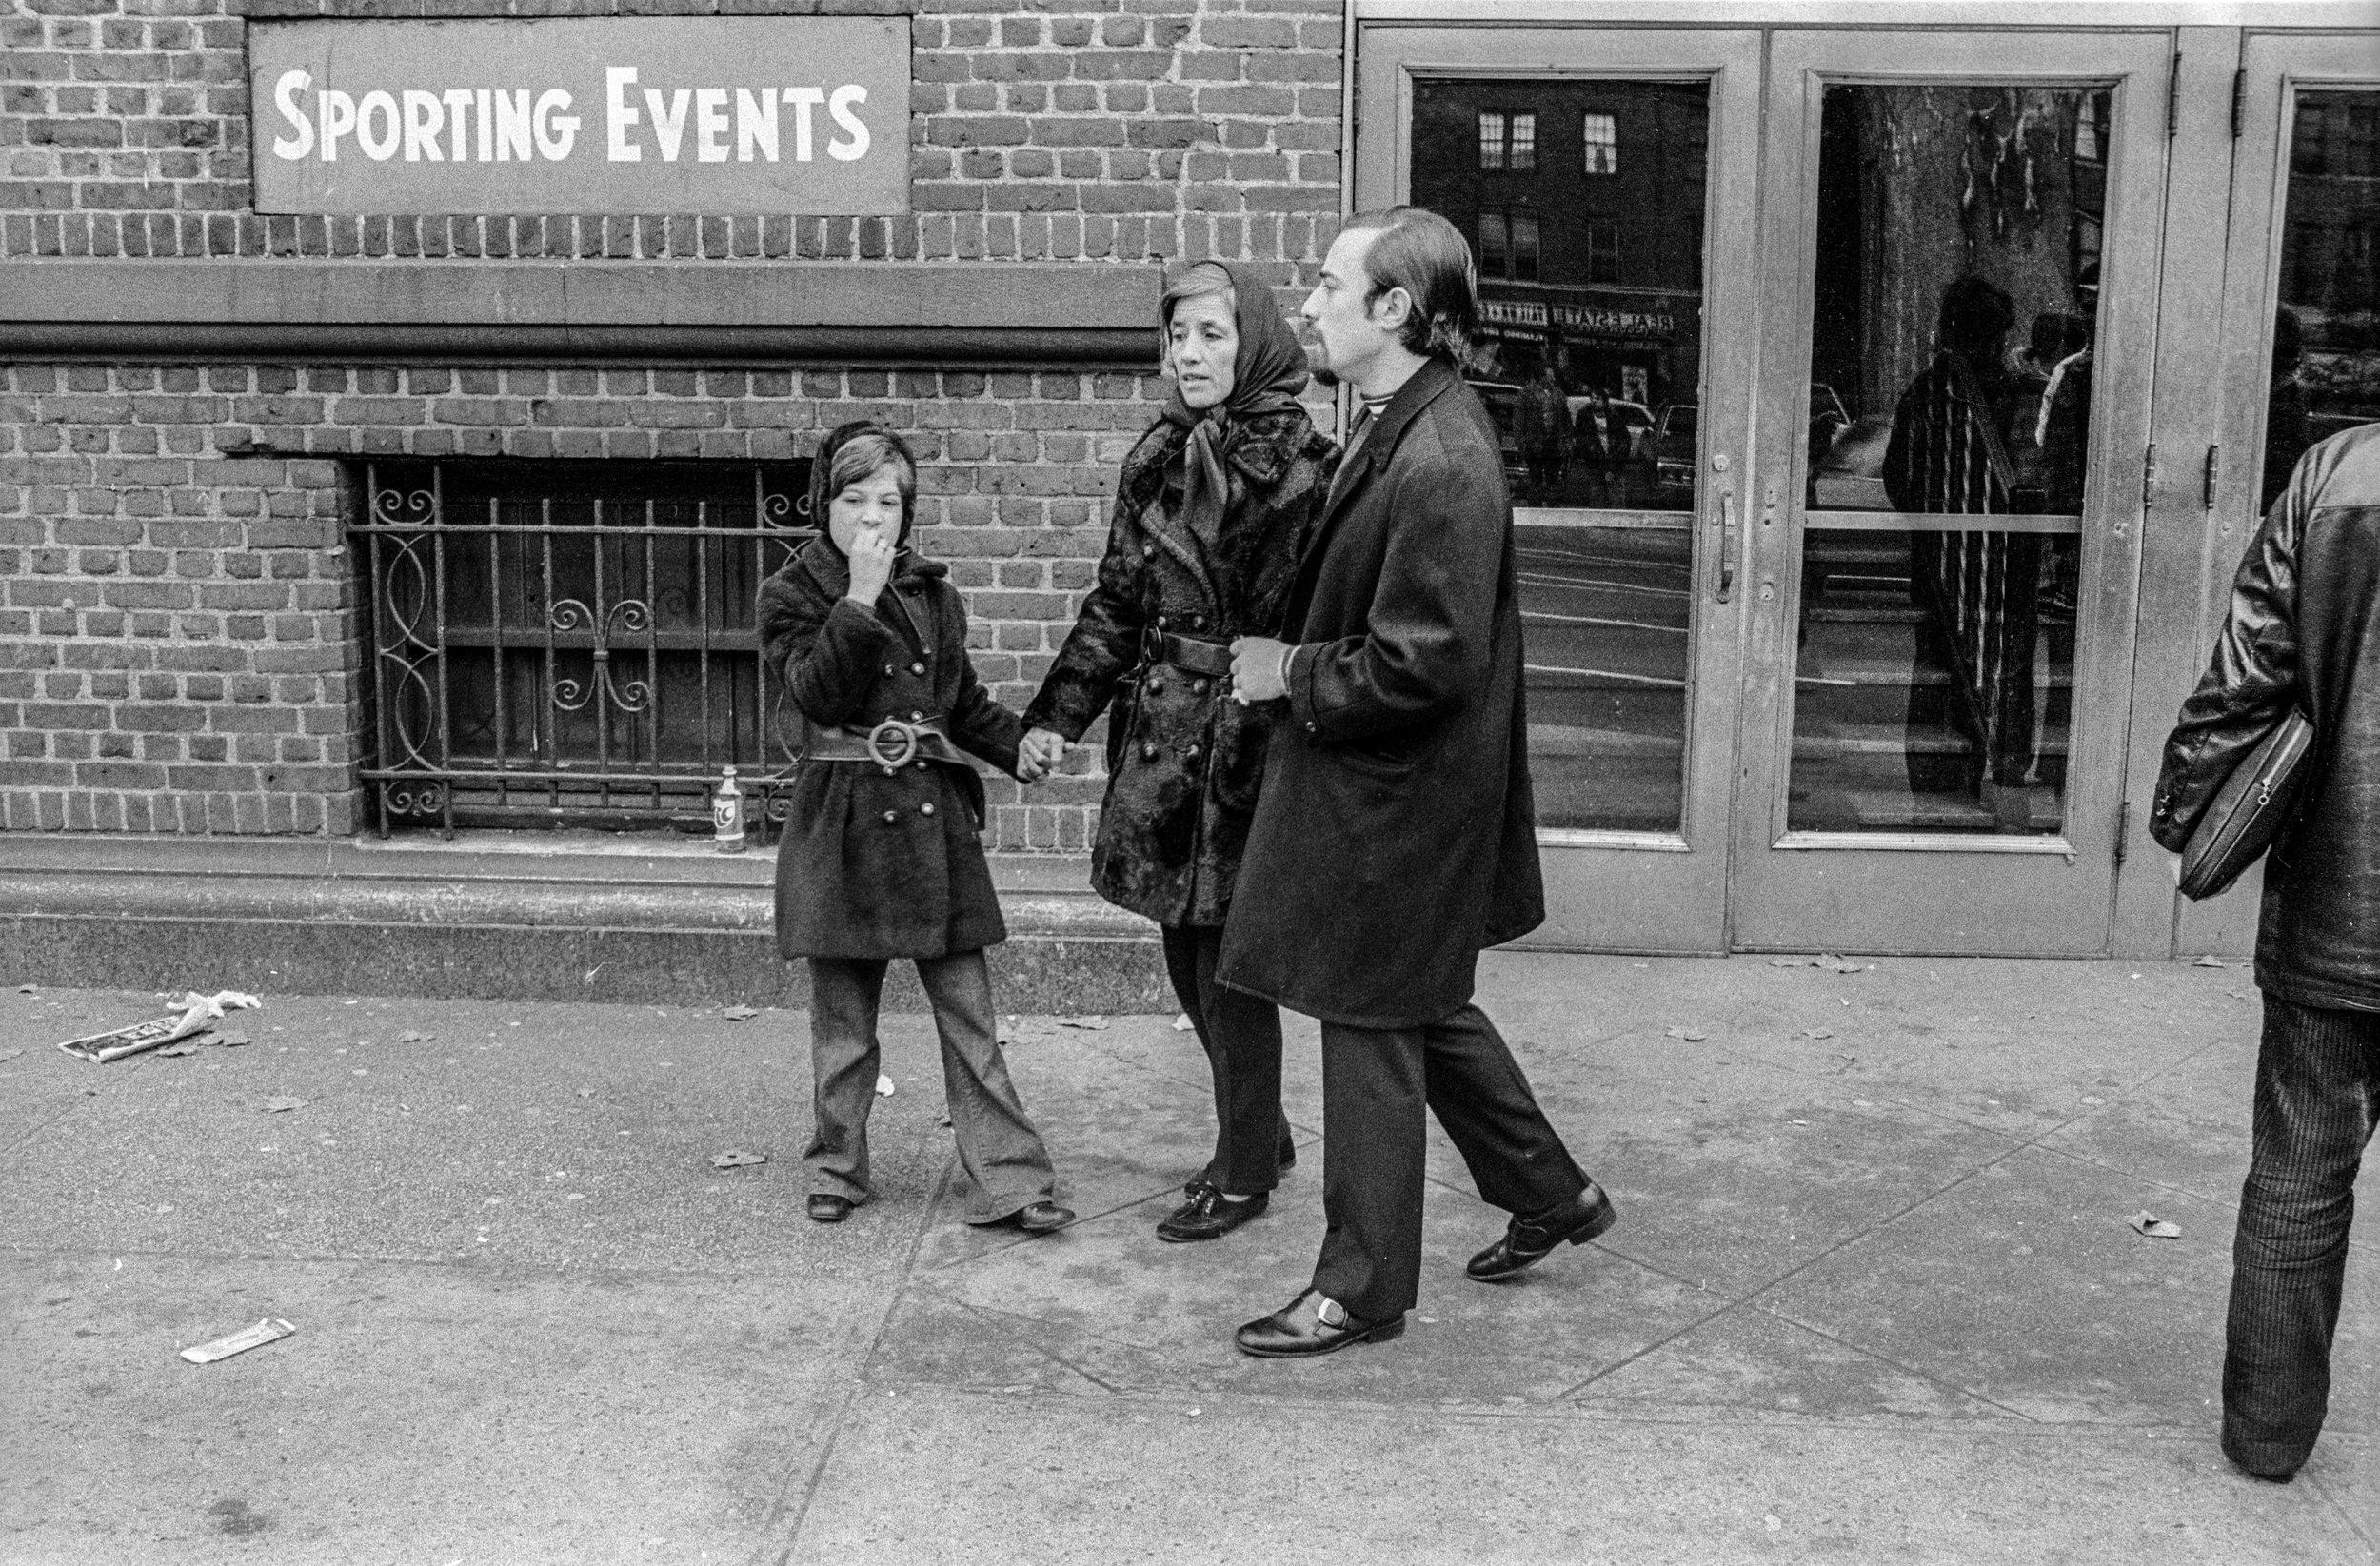 Sunnyside Gardens Arena, 1972